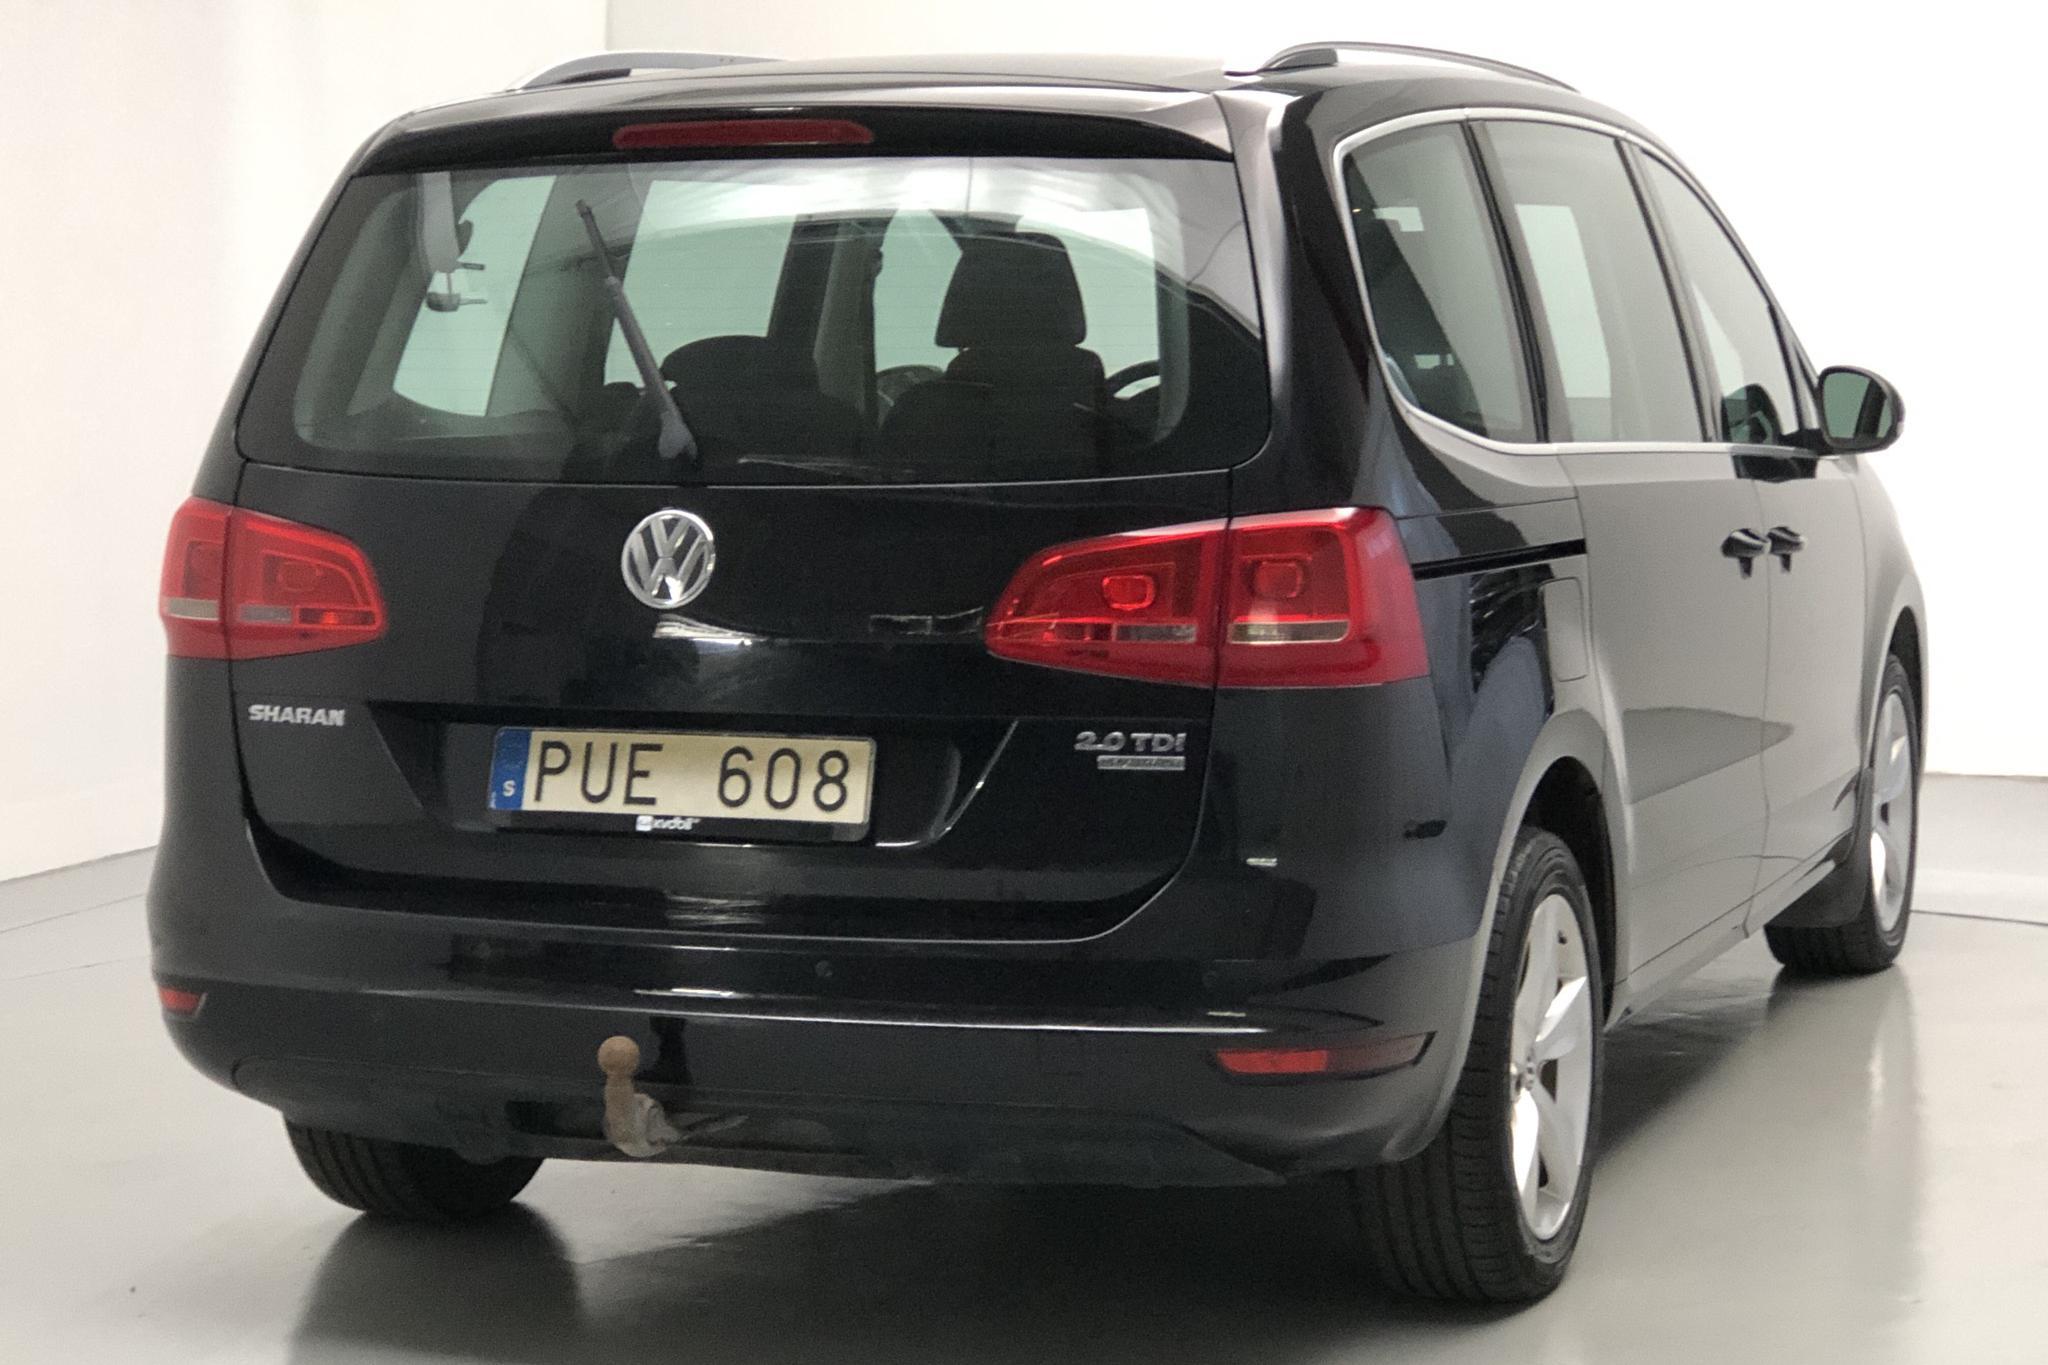 VW Sharan 2.0 TDI BlueMotion Technology 4motion (140hk) - 163 170 km - Manual - black - 2012